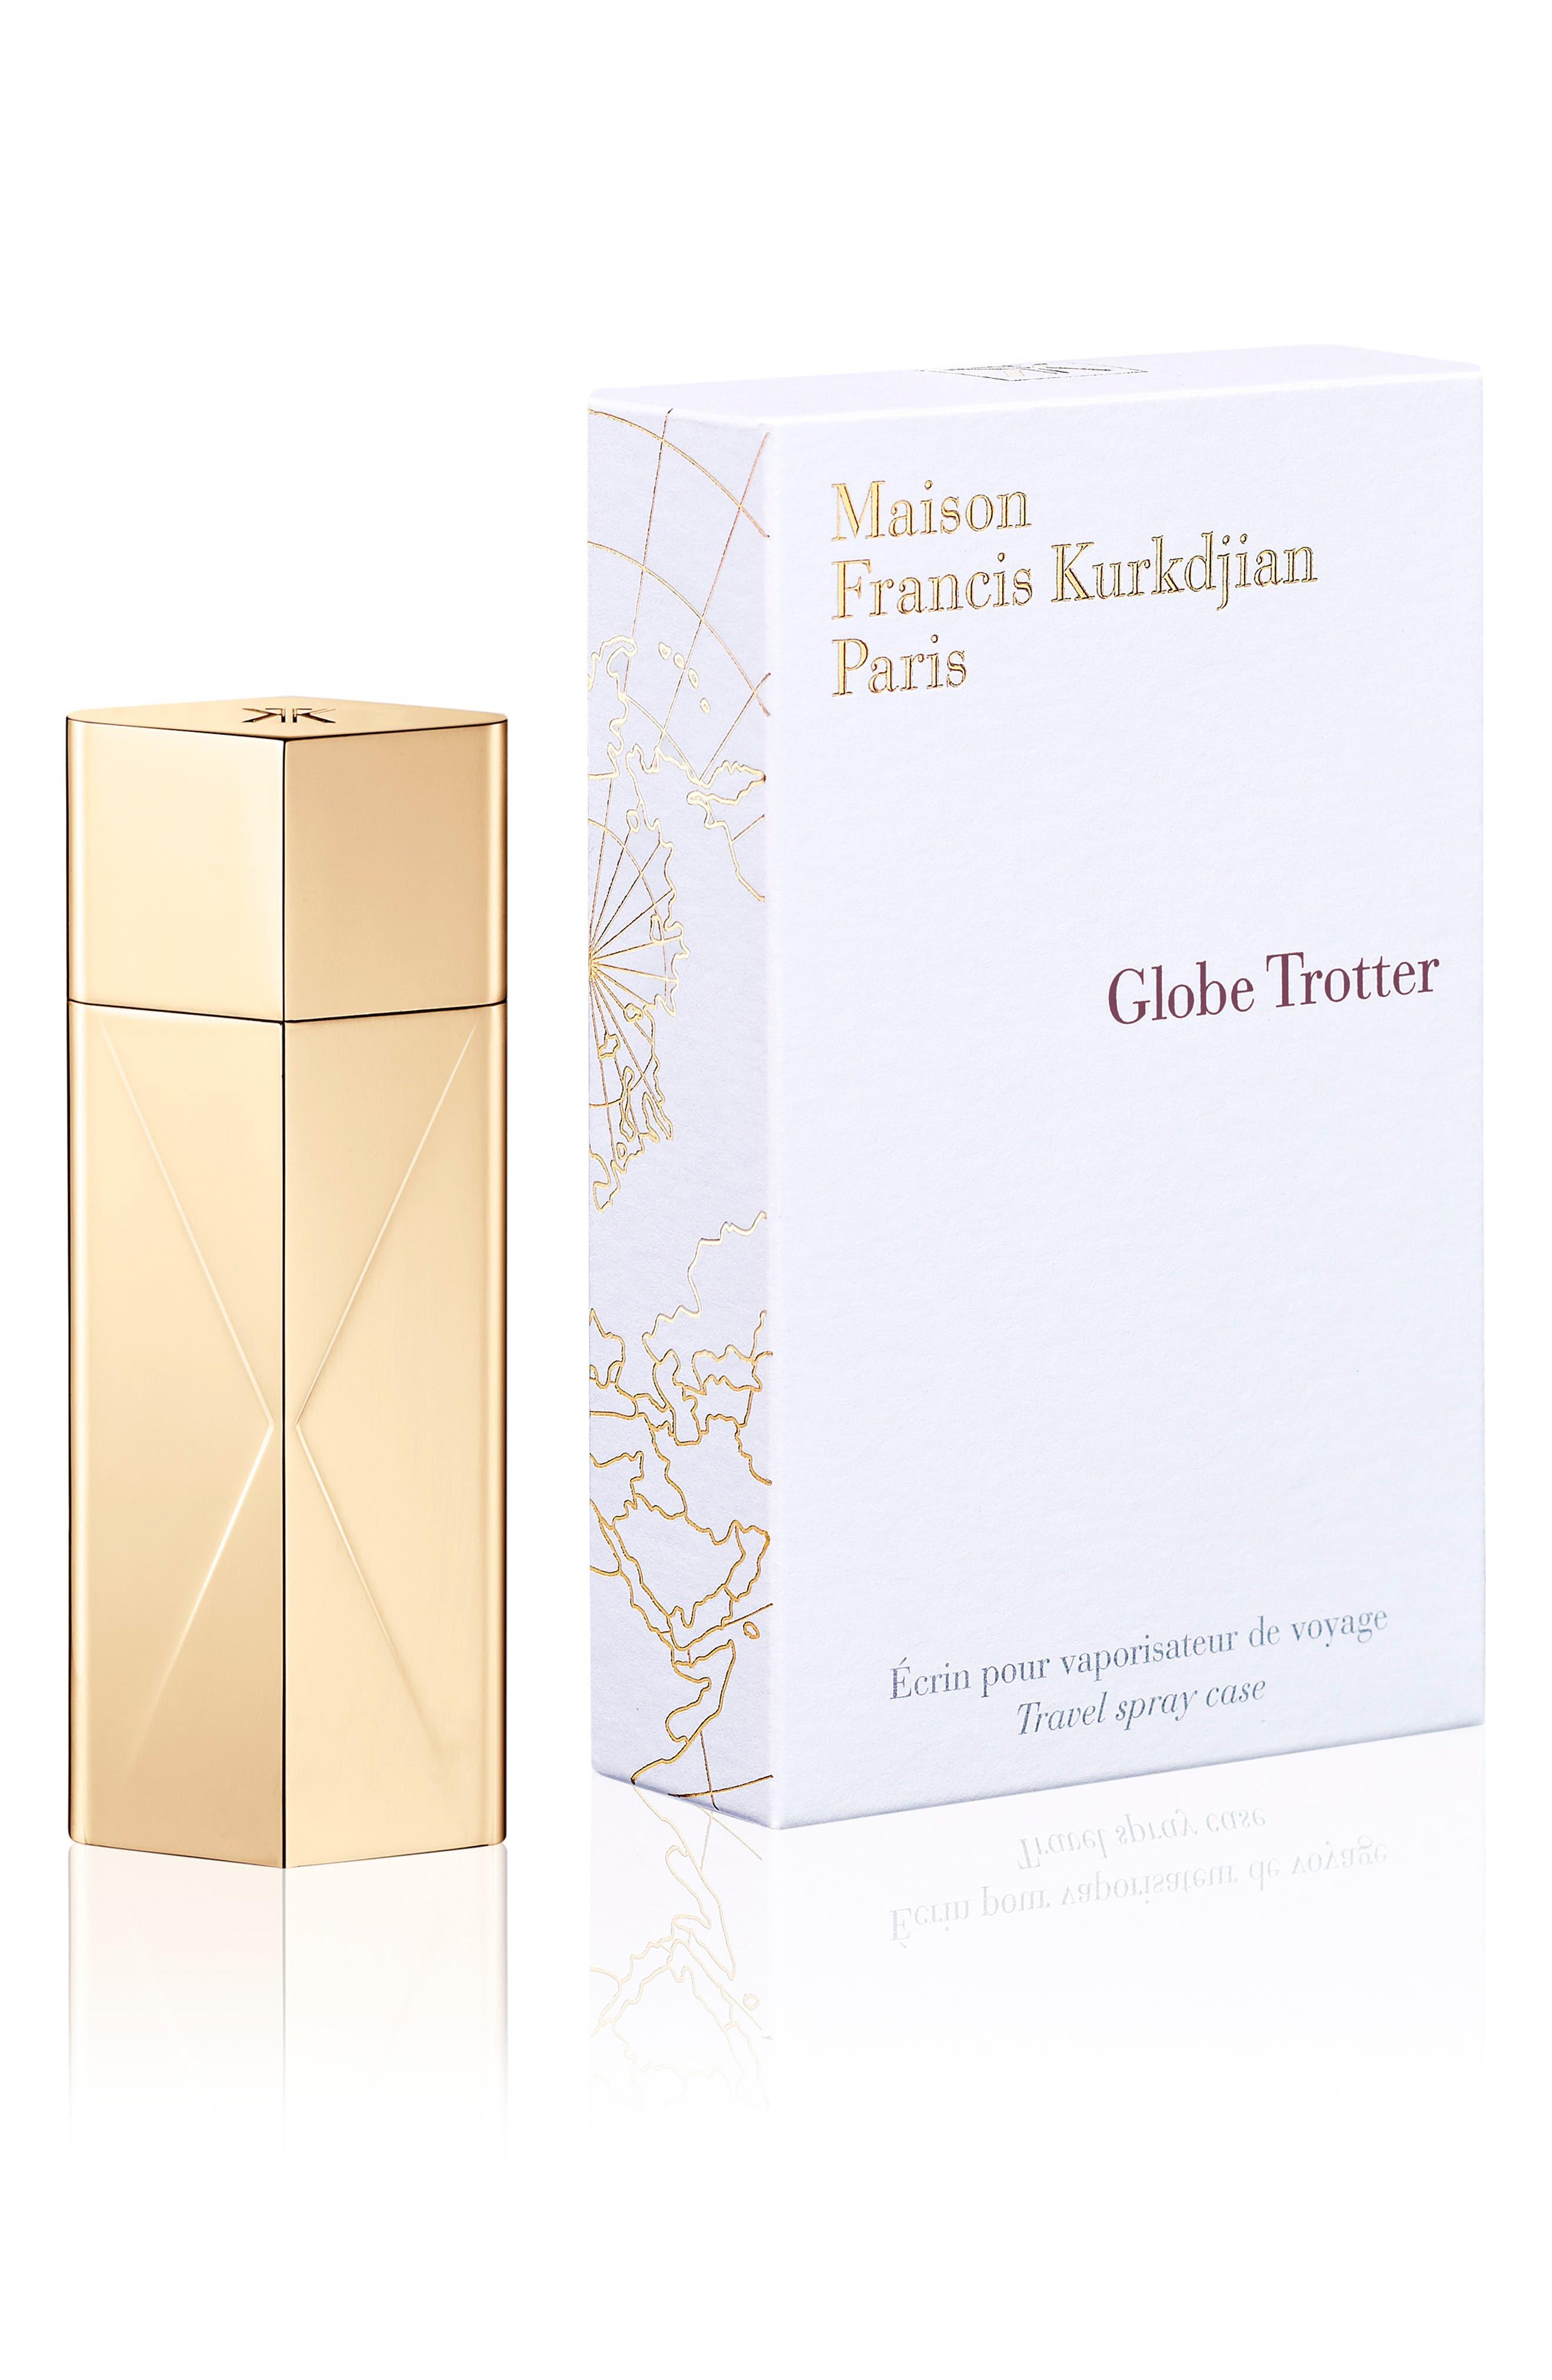 Paris Globe Trotter Gold Travel Spray Case